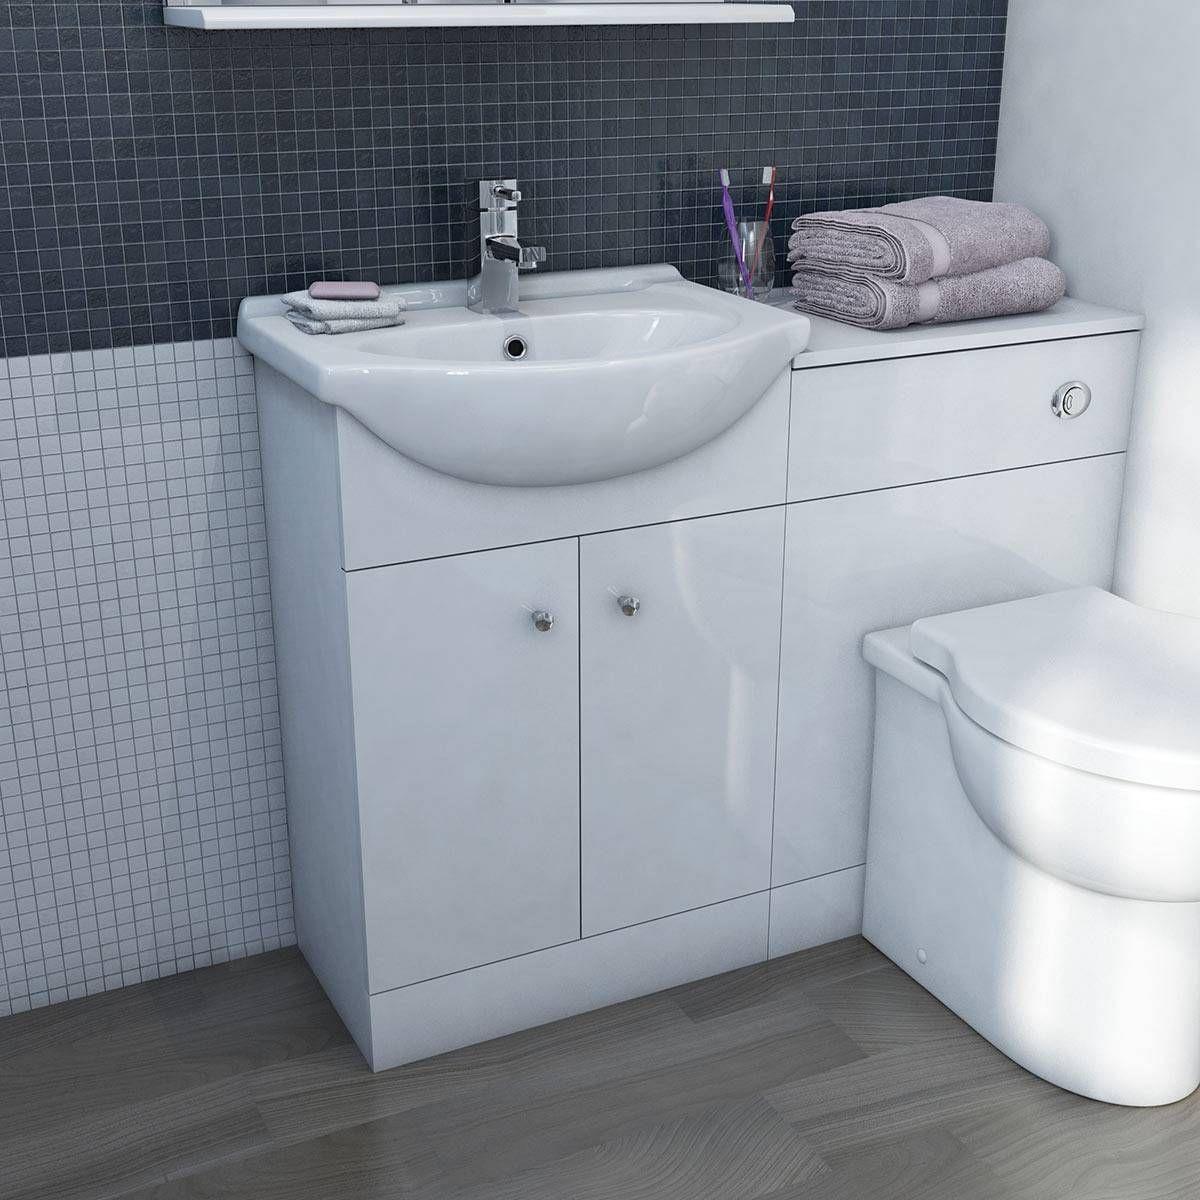 toilet minimal floor standing - Google Search | Bath | Pinterest ...